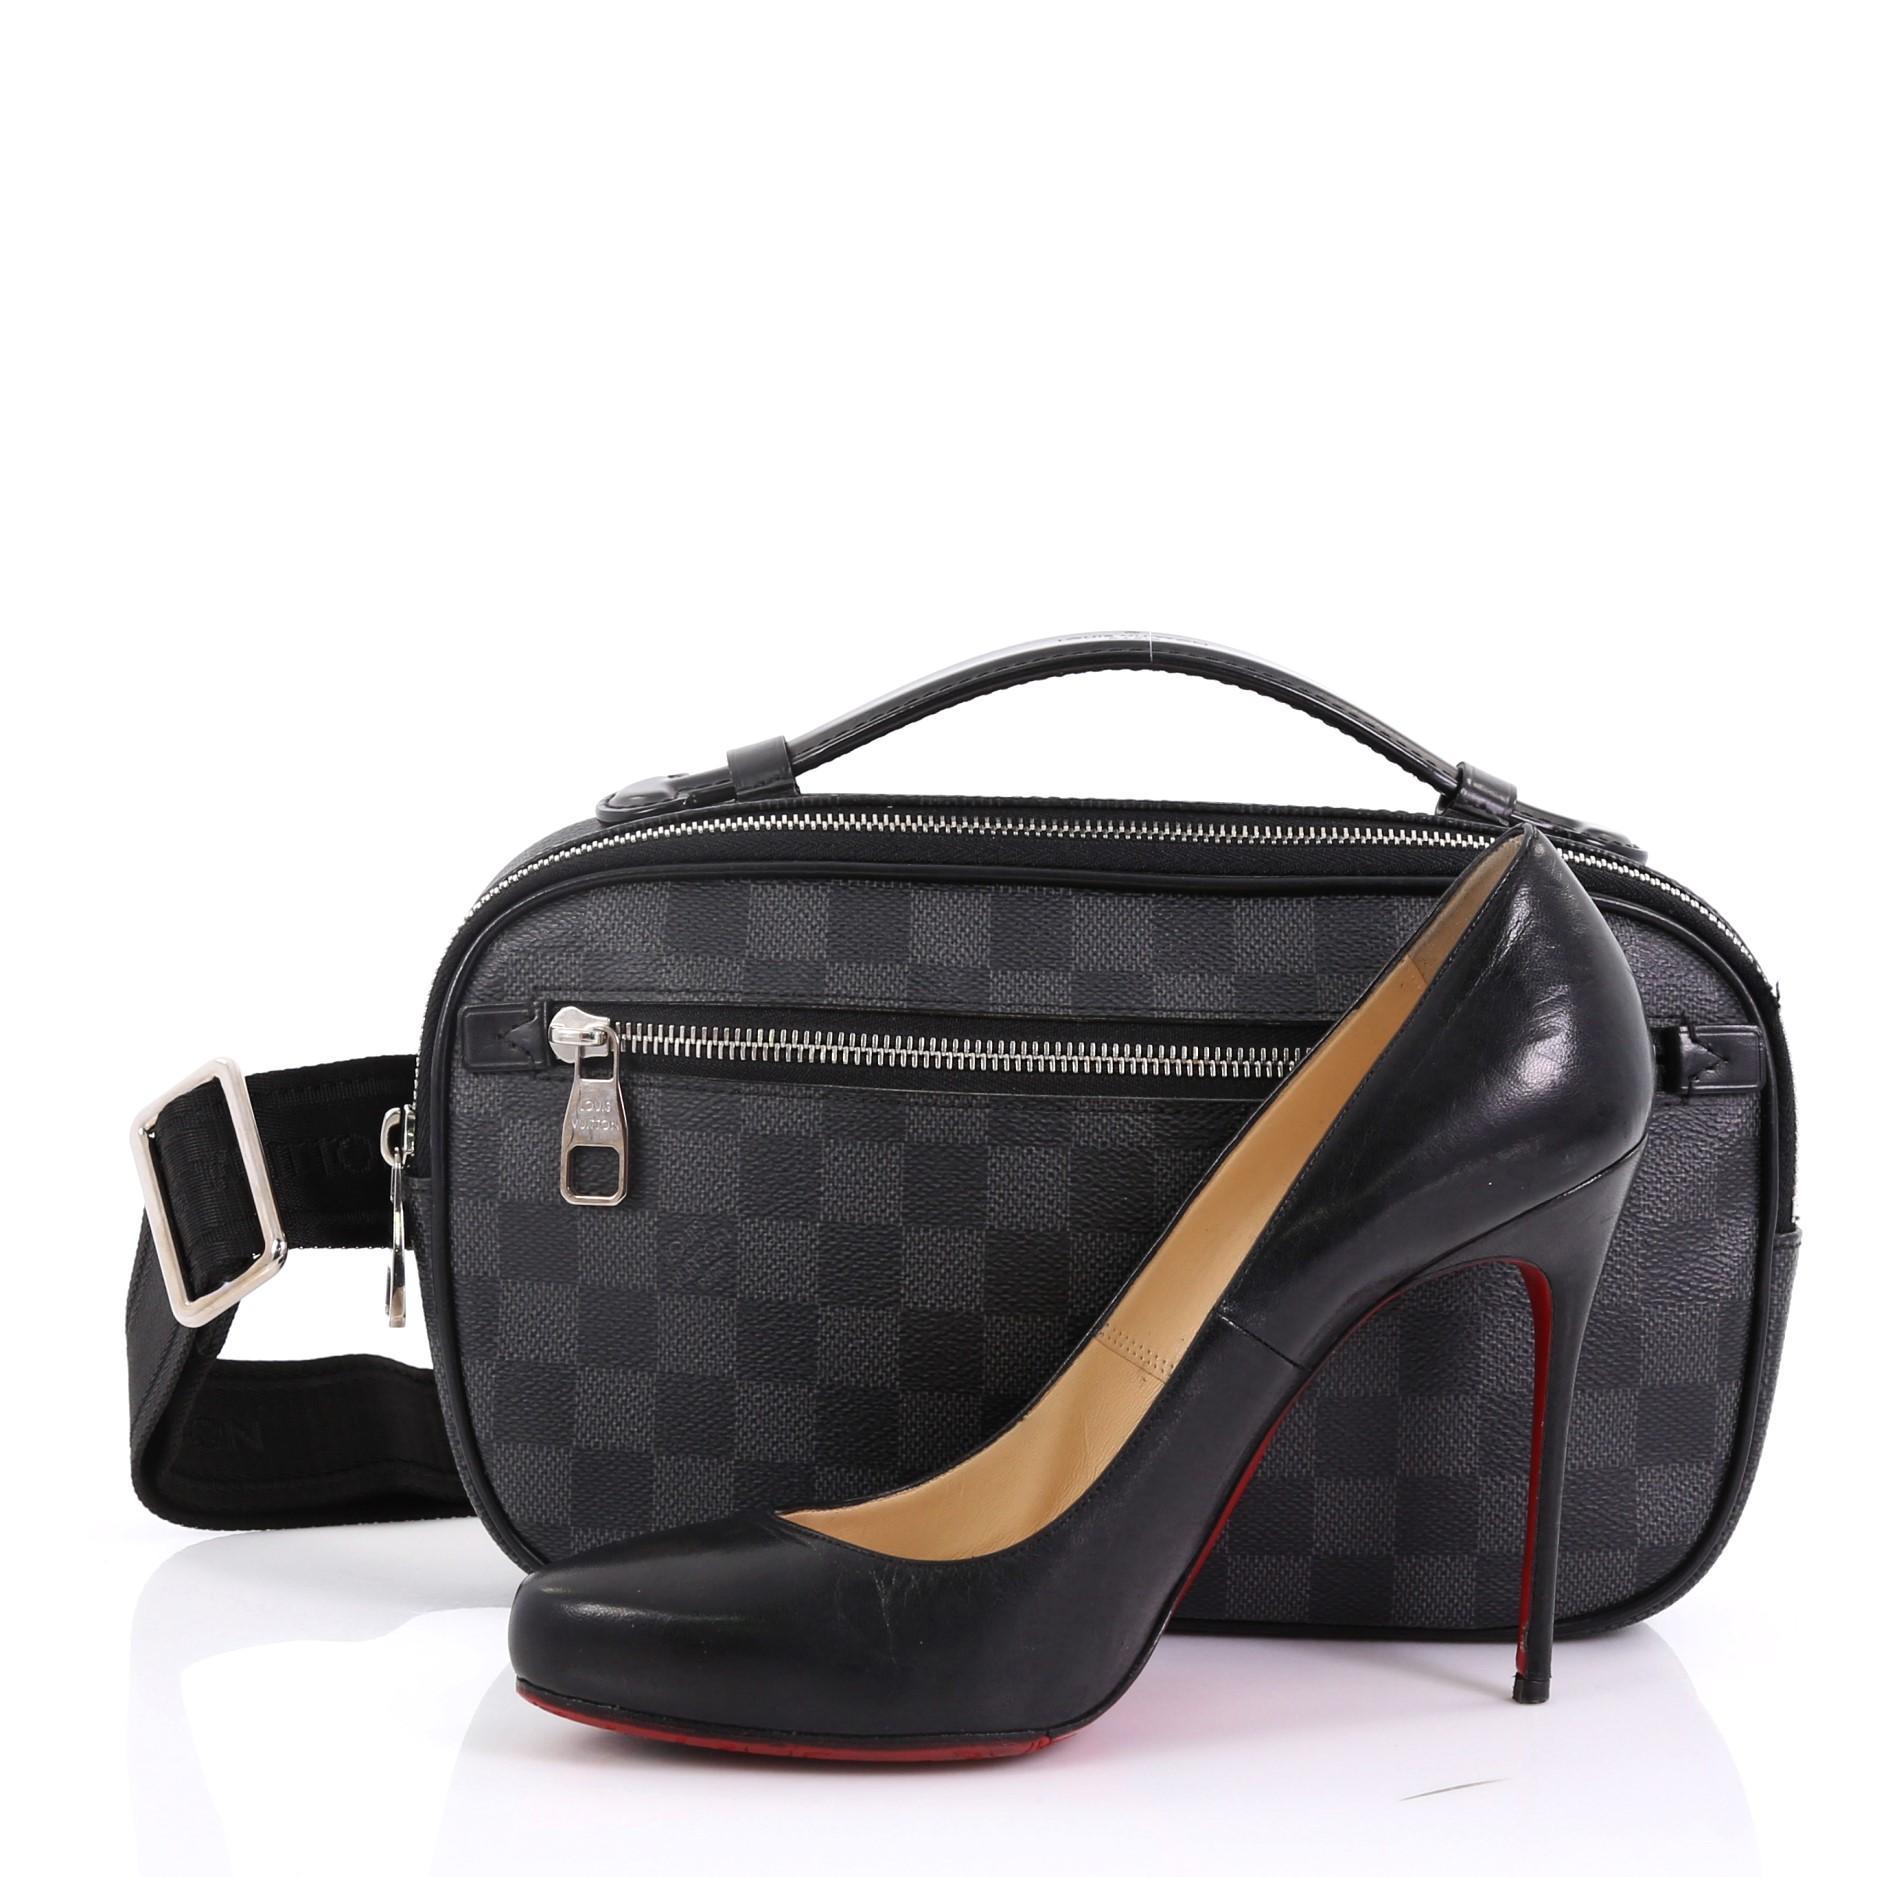 4b690dbbcc22 Louis Vuitton Ambler Bag Damier Graphite For Sale at 1stdibs